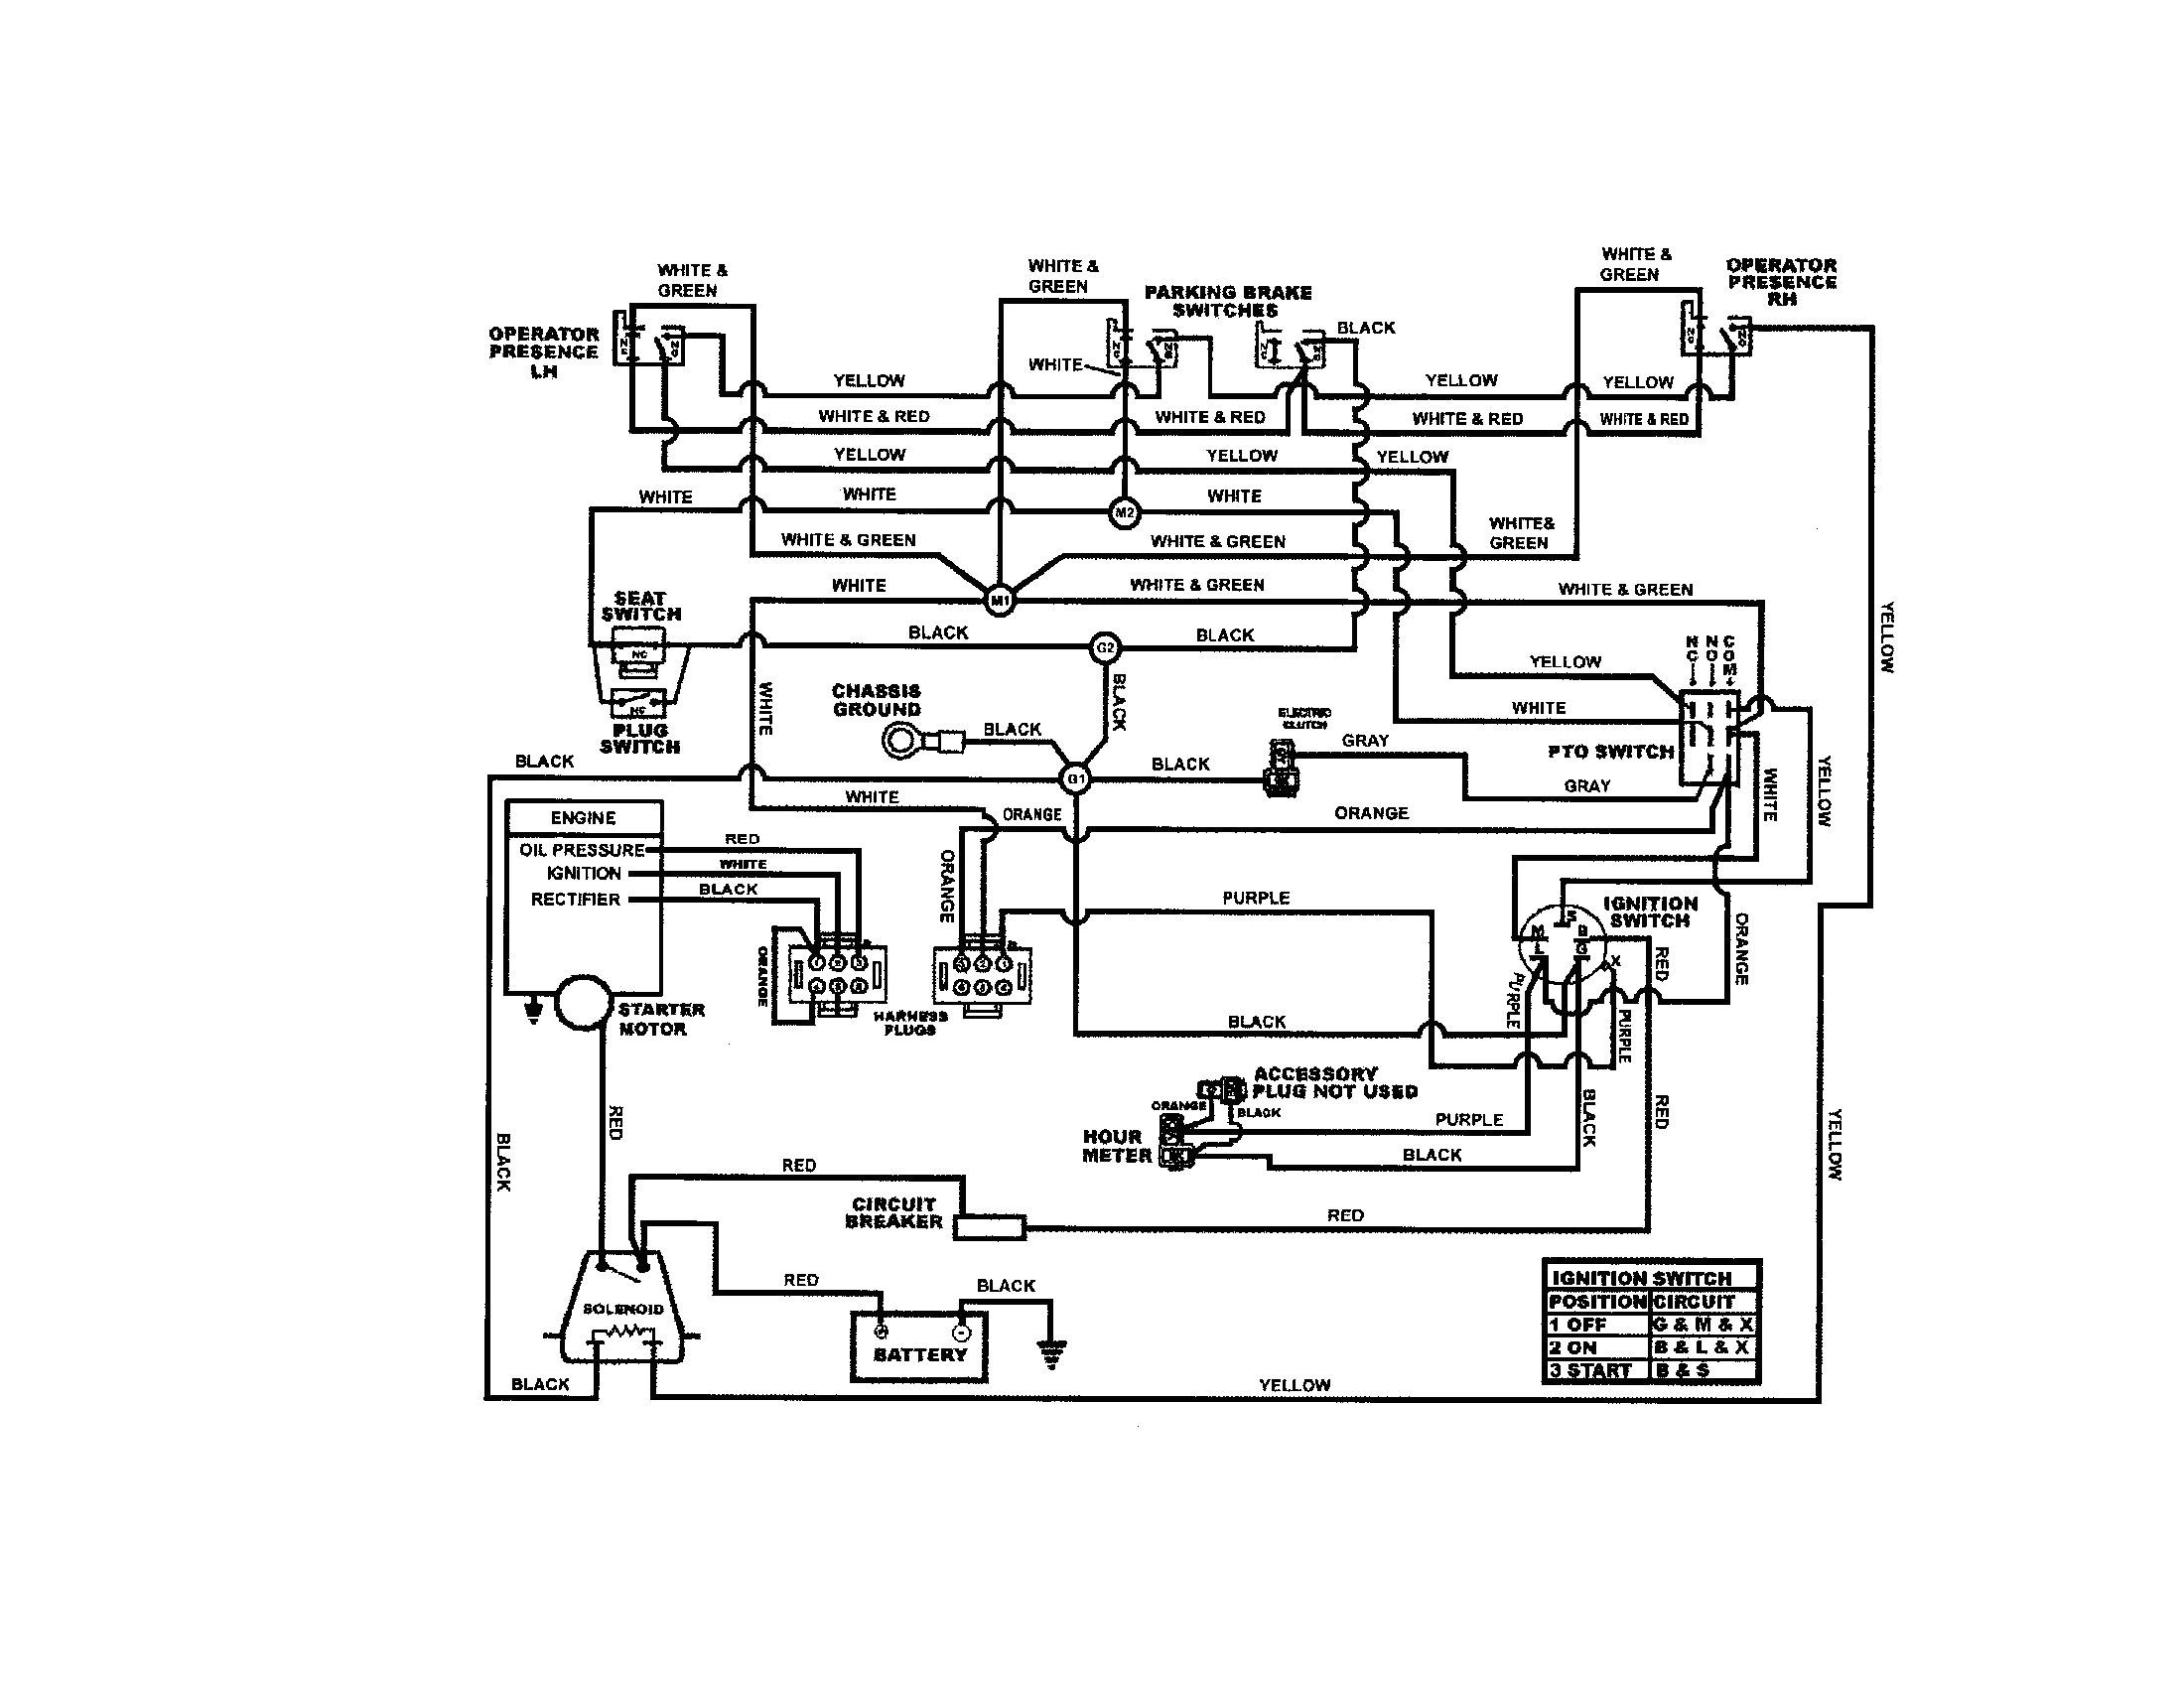 briggs and stratton ignition coil wiring diagram beautiful briggs and stratton wiring diagram car tuning data schema